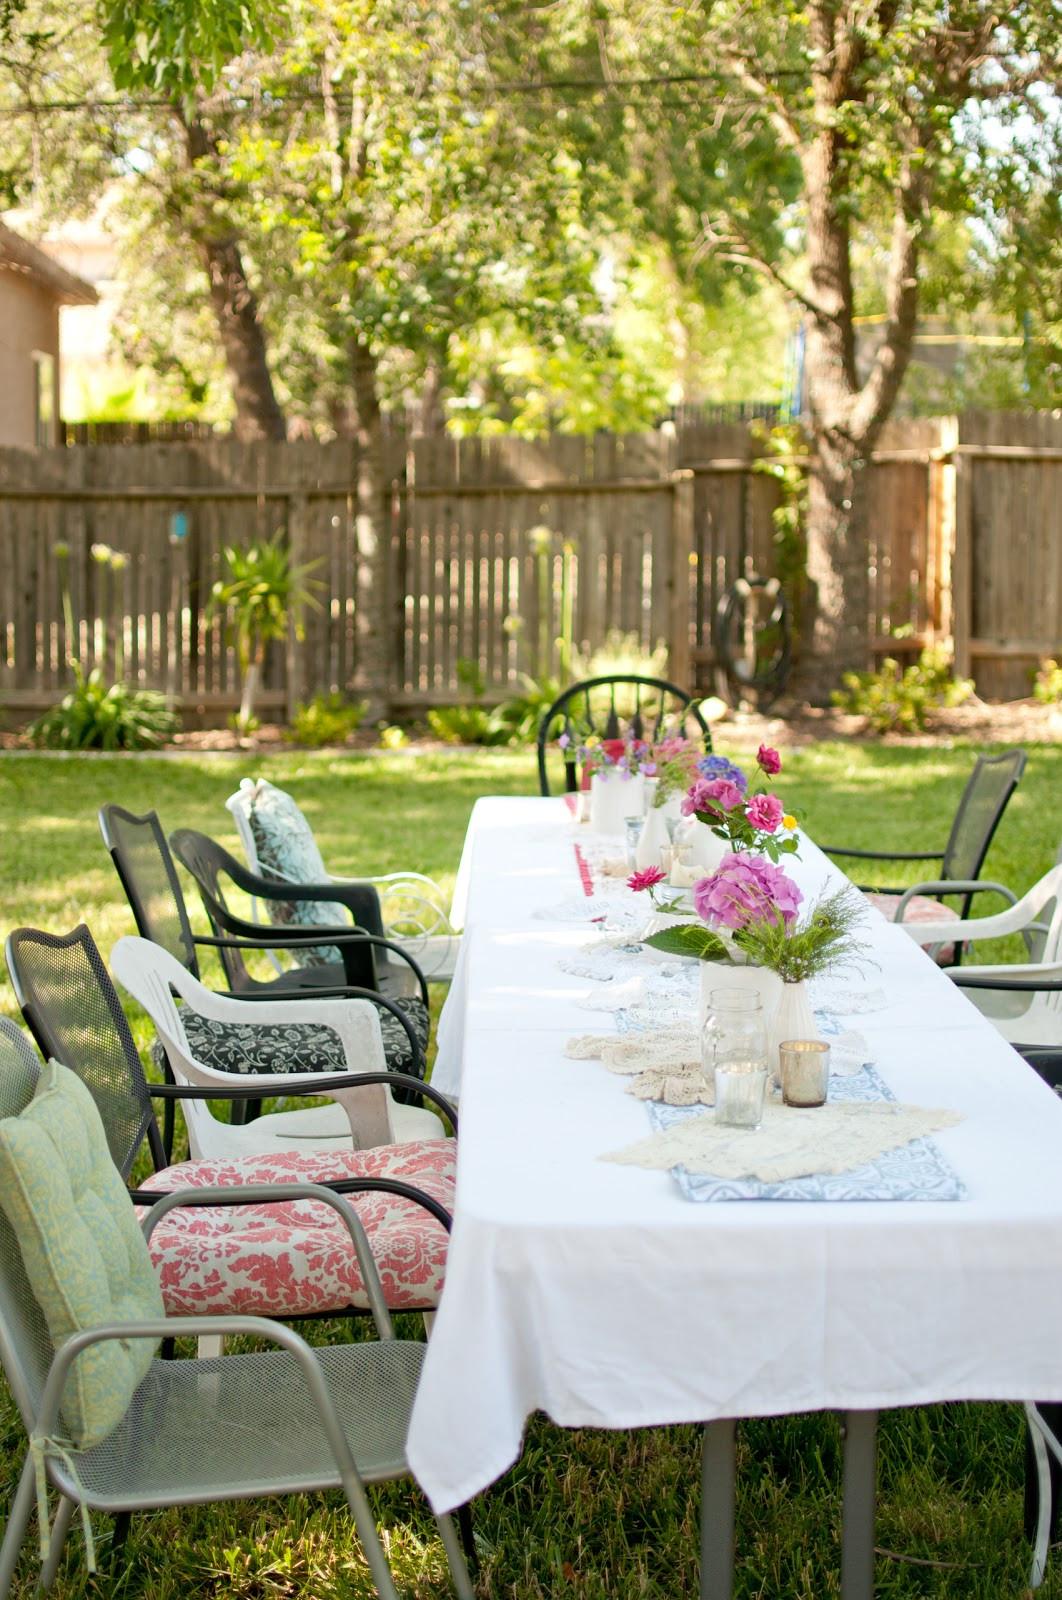 Party In Backyard Ideas  Domestic Fashionista Summer Backyard Birthday Party